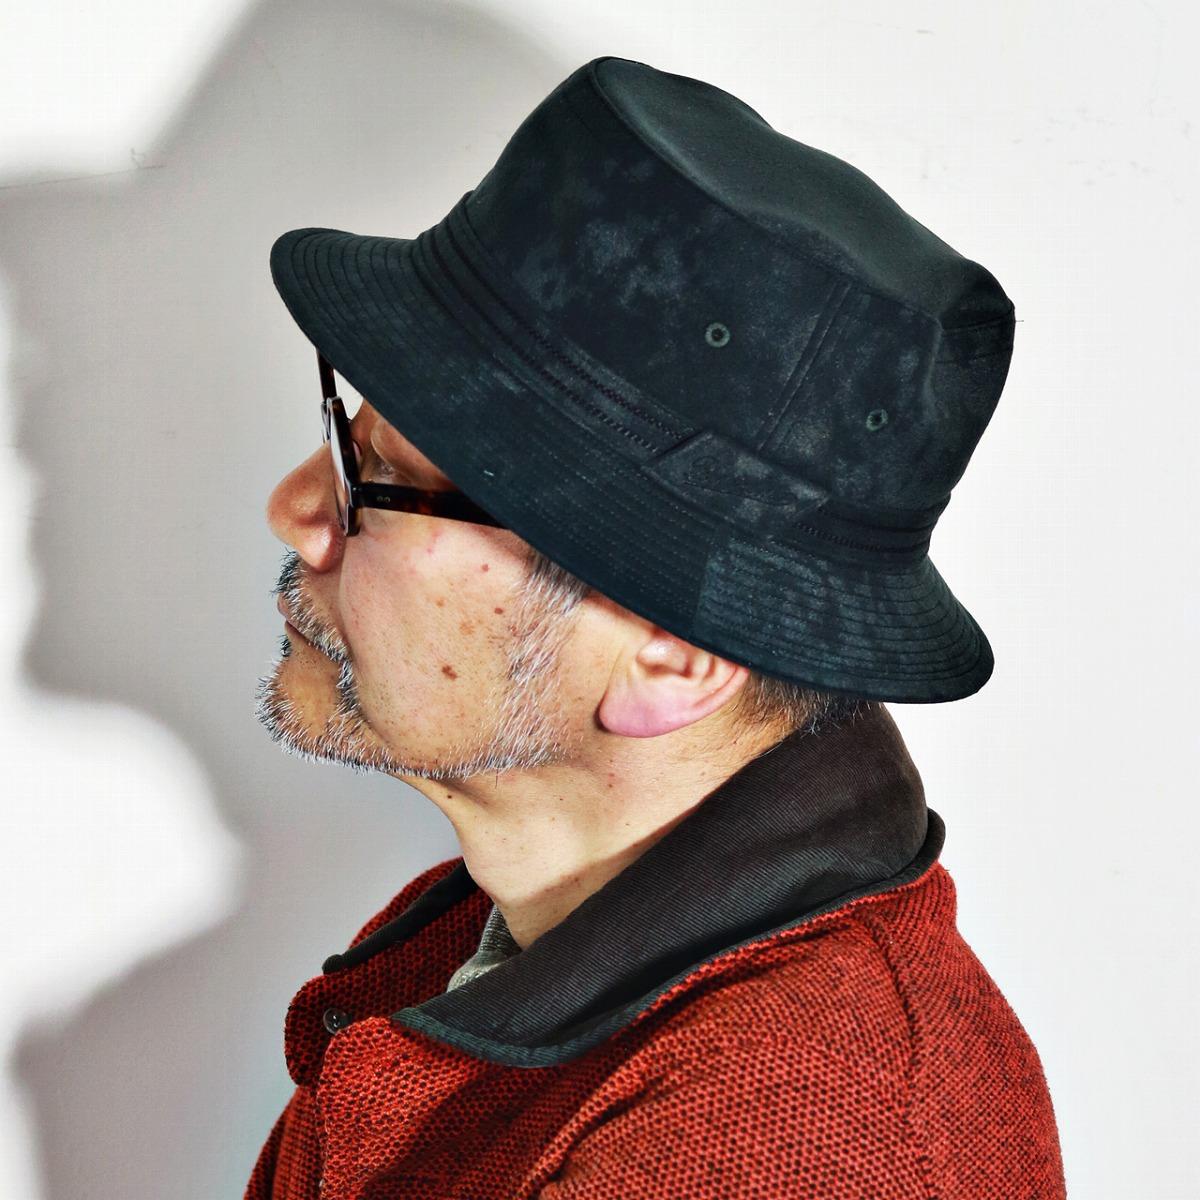 dd215d66dd2 Borsalino (borsalino) selling TCM HAT dark grey (large size outdoor fall  for fall winter merchandise Hat CAP and Safari Hat Christmas gifts outdoor  Safari ...